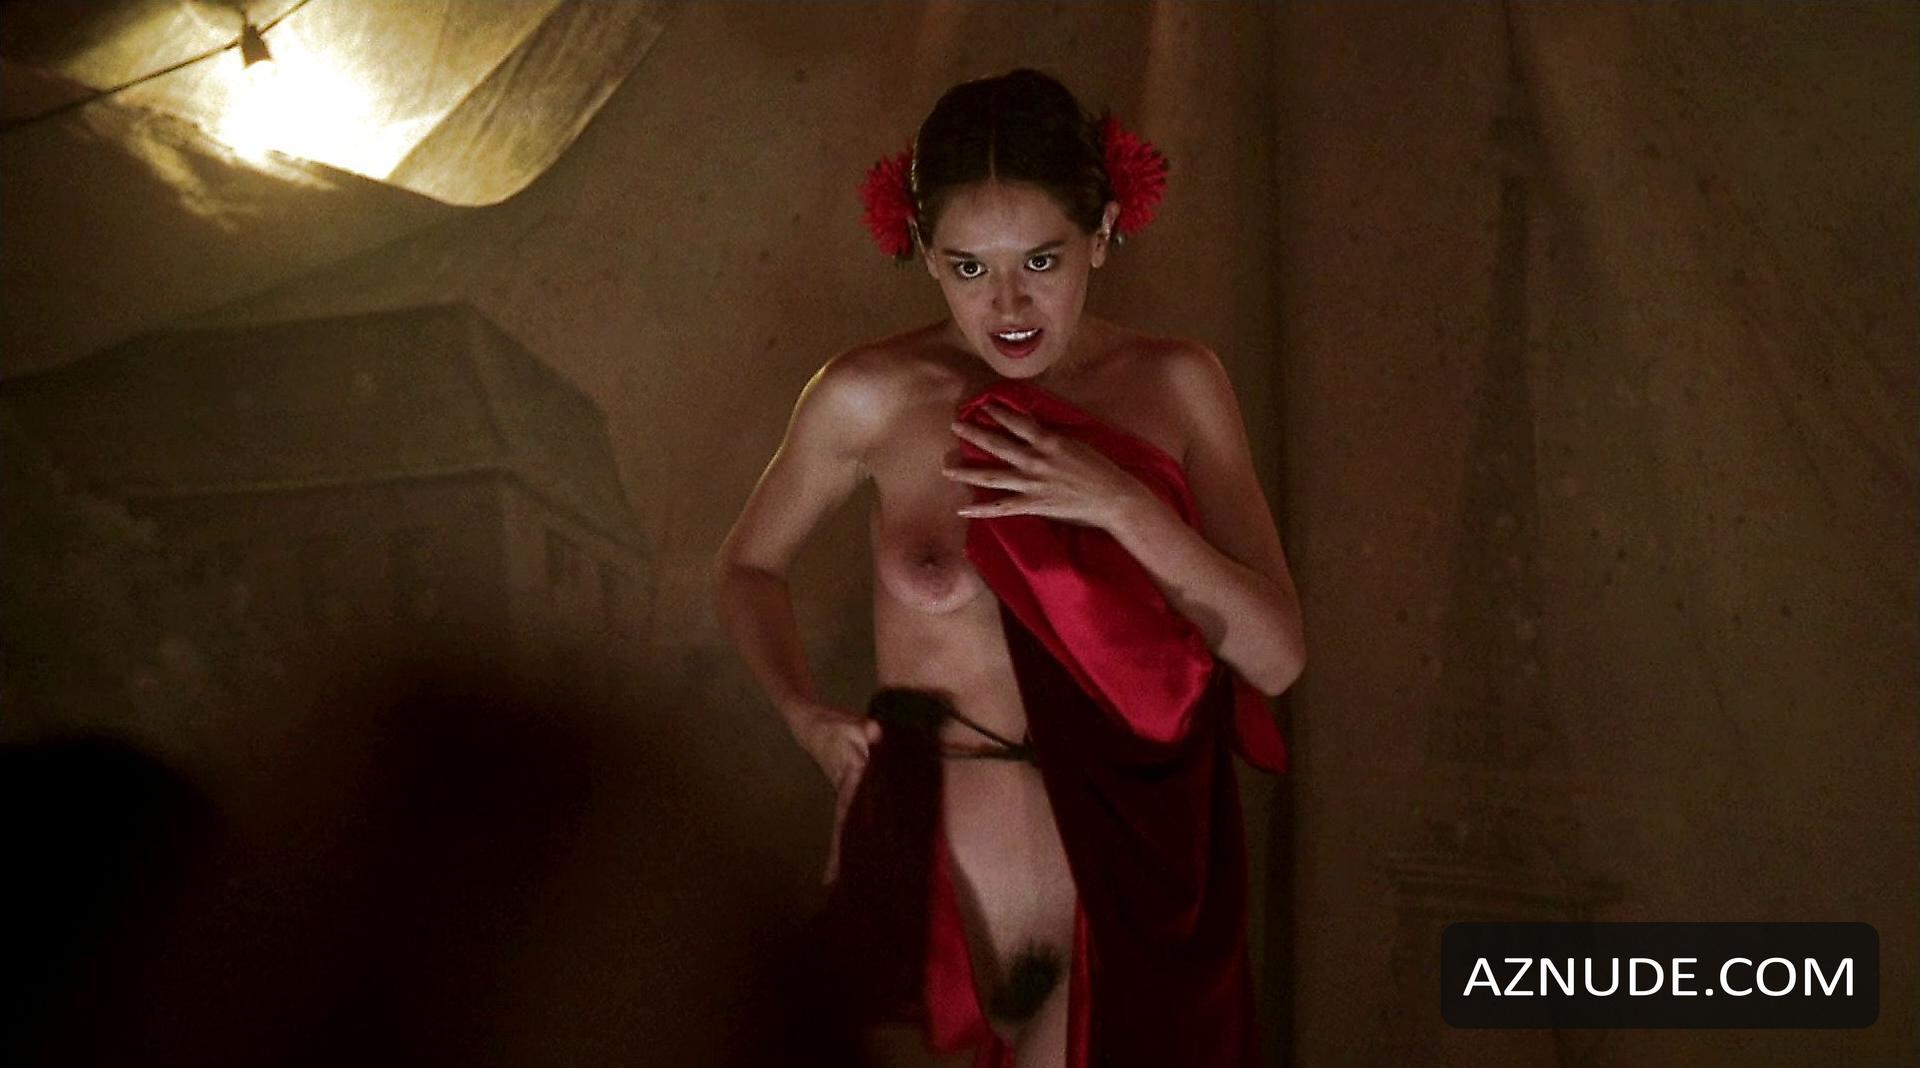 VALERIA HERNANDEZ Nude - AZNude